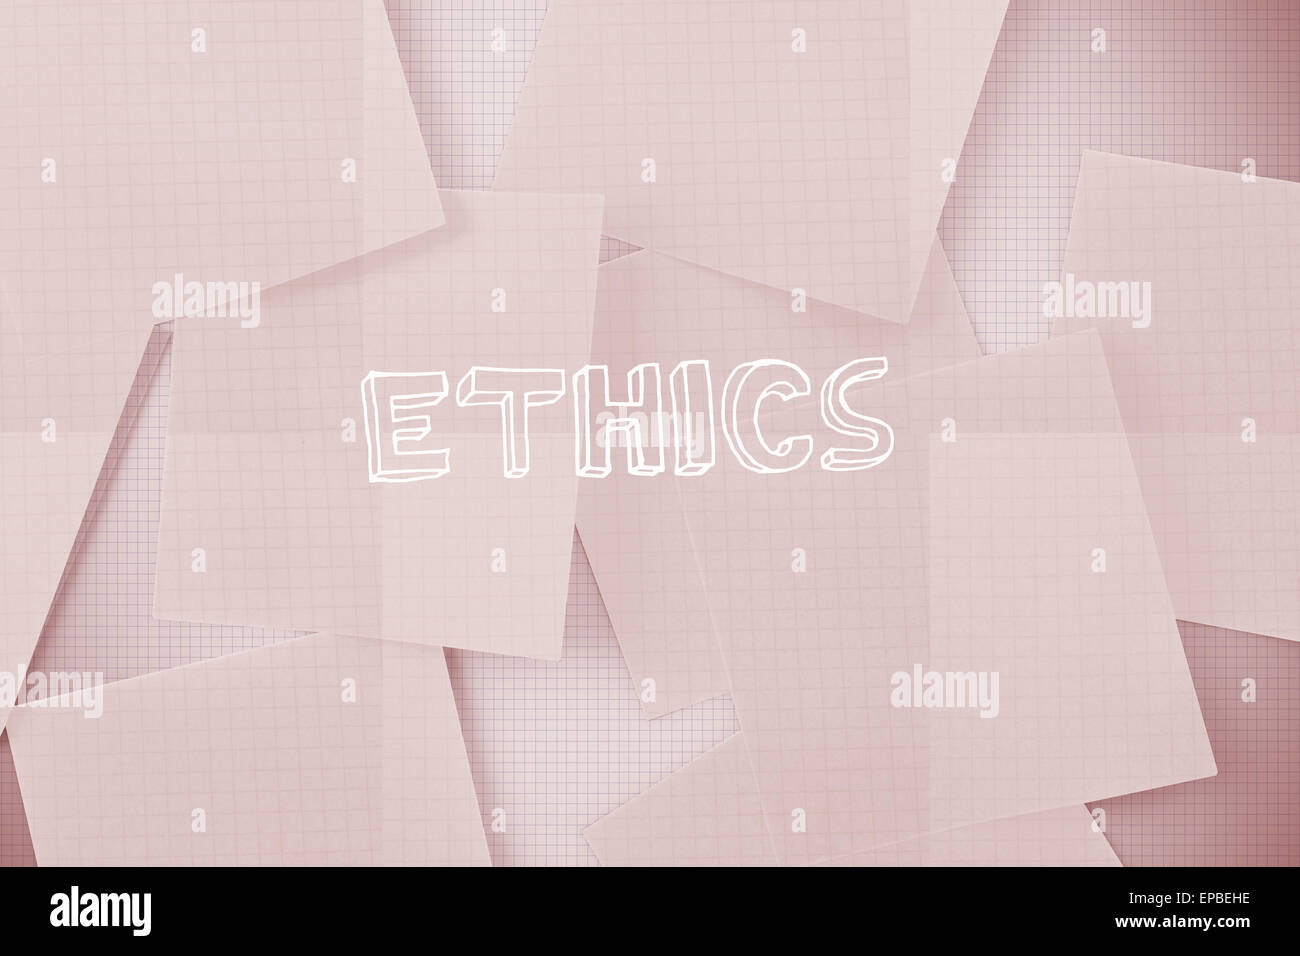 Ethics against white paper strewn over grid - Stock Image